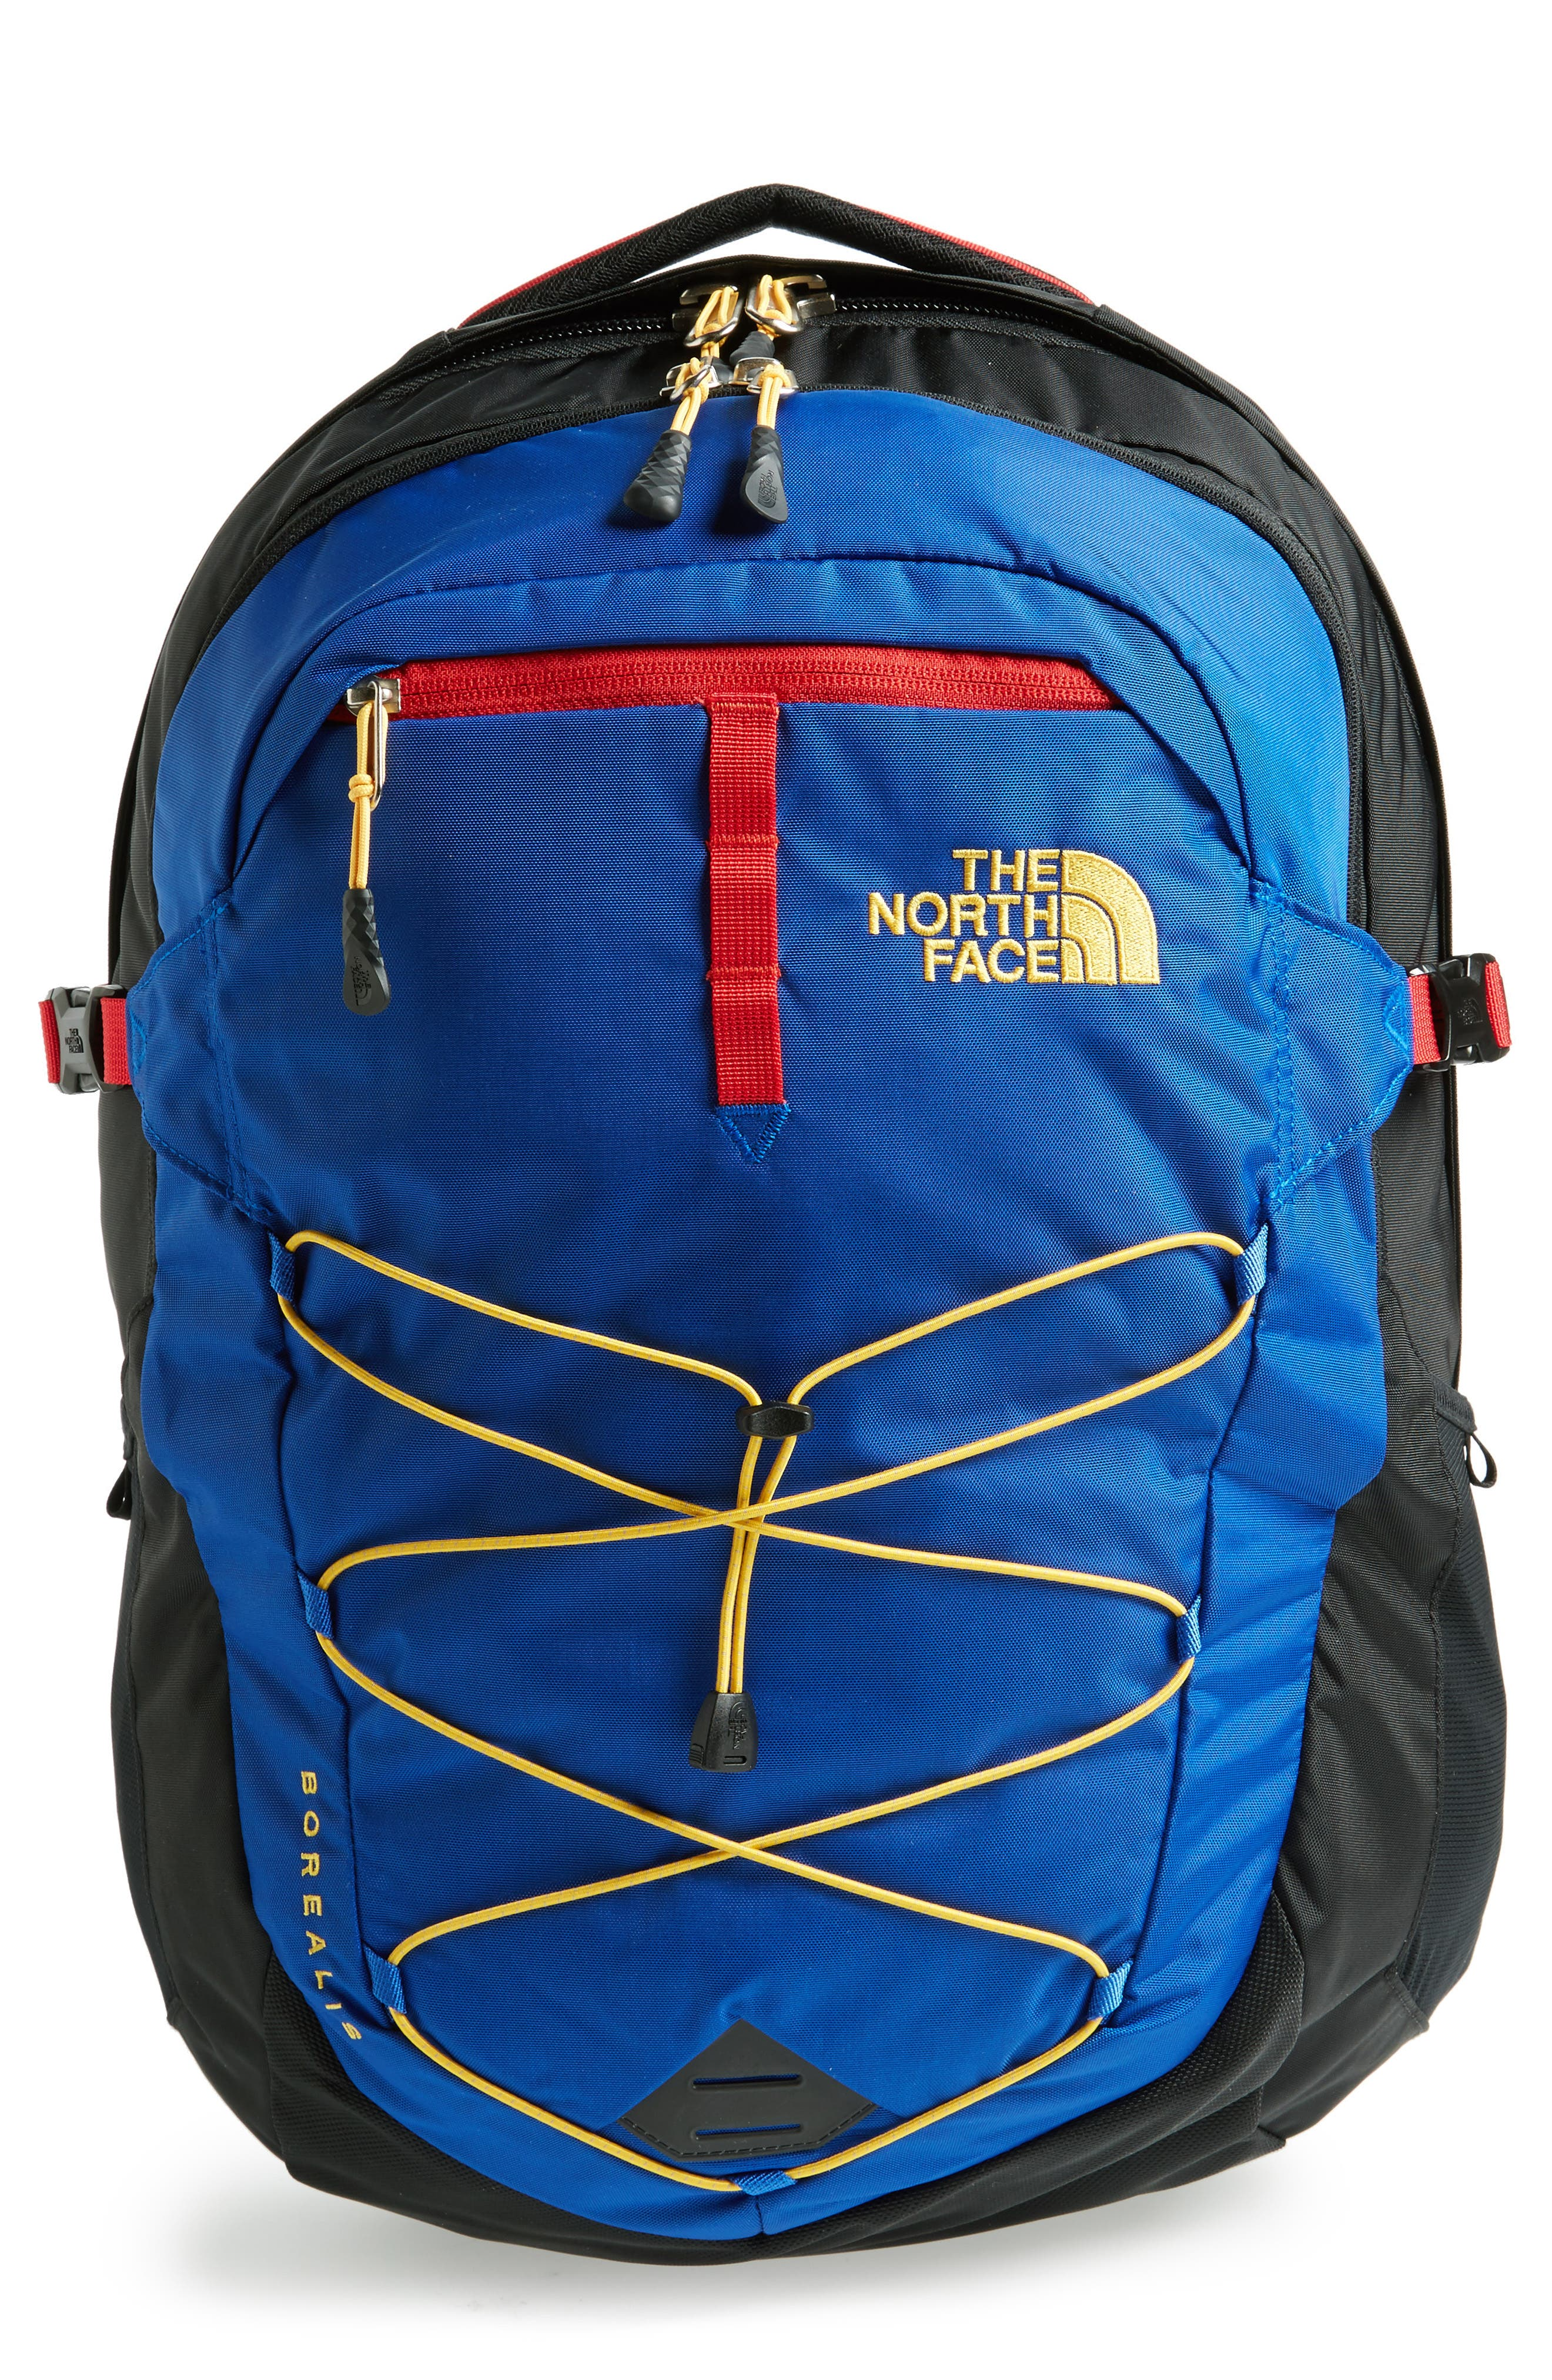 Borealis Backpack,                             Main thumbnail 1, color,                             402